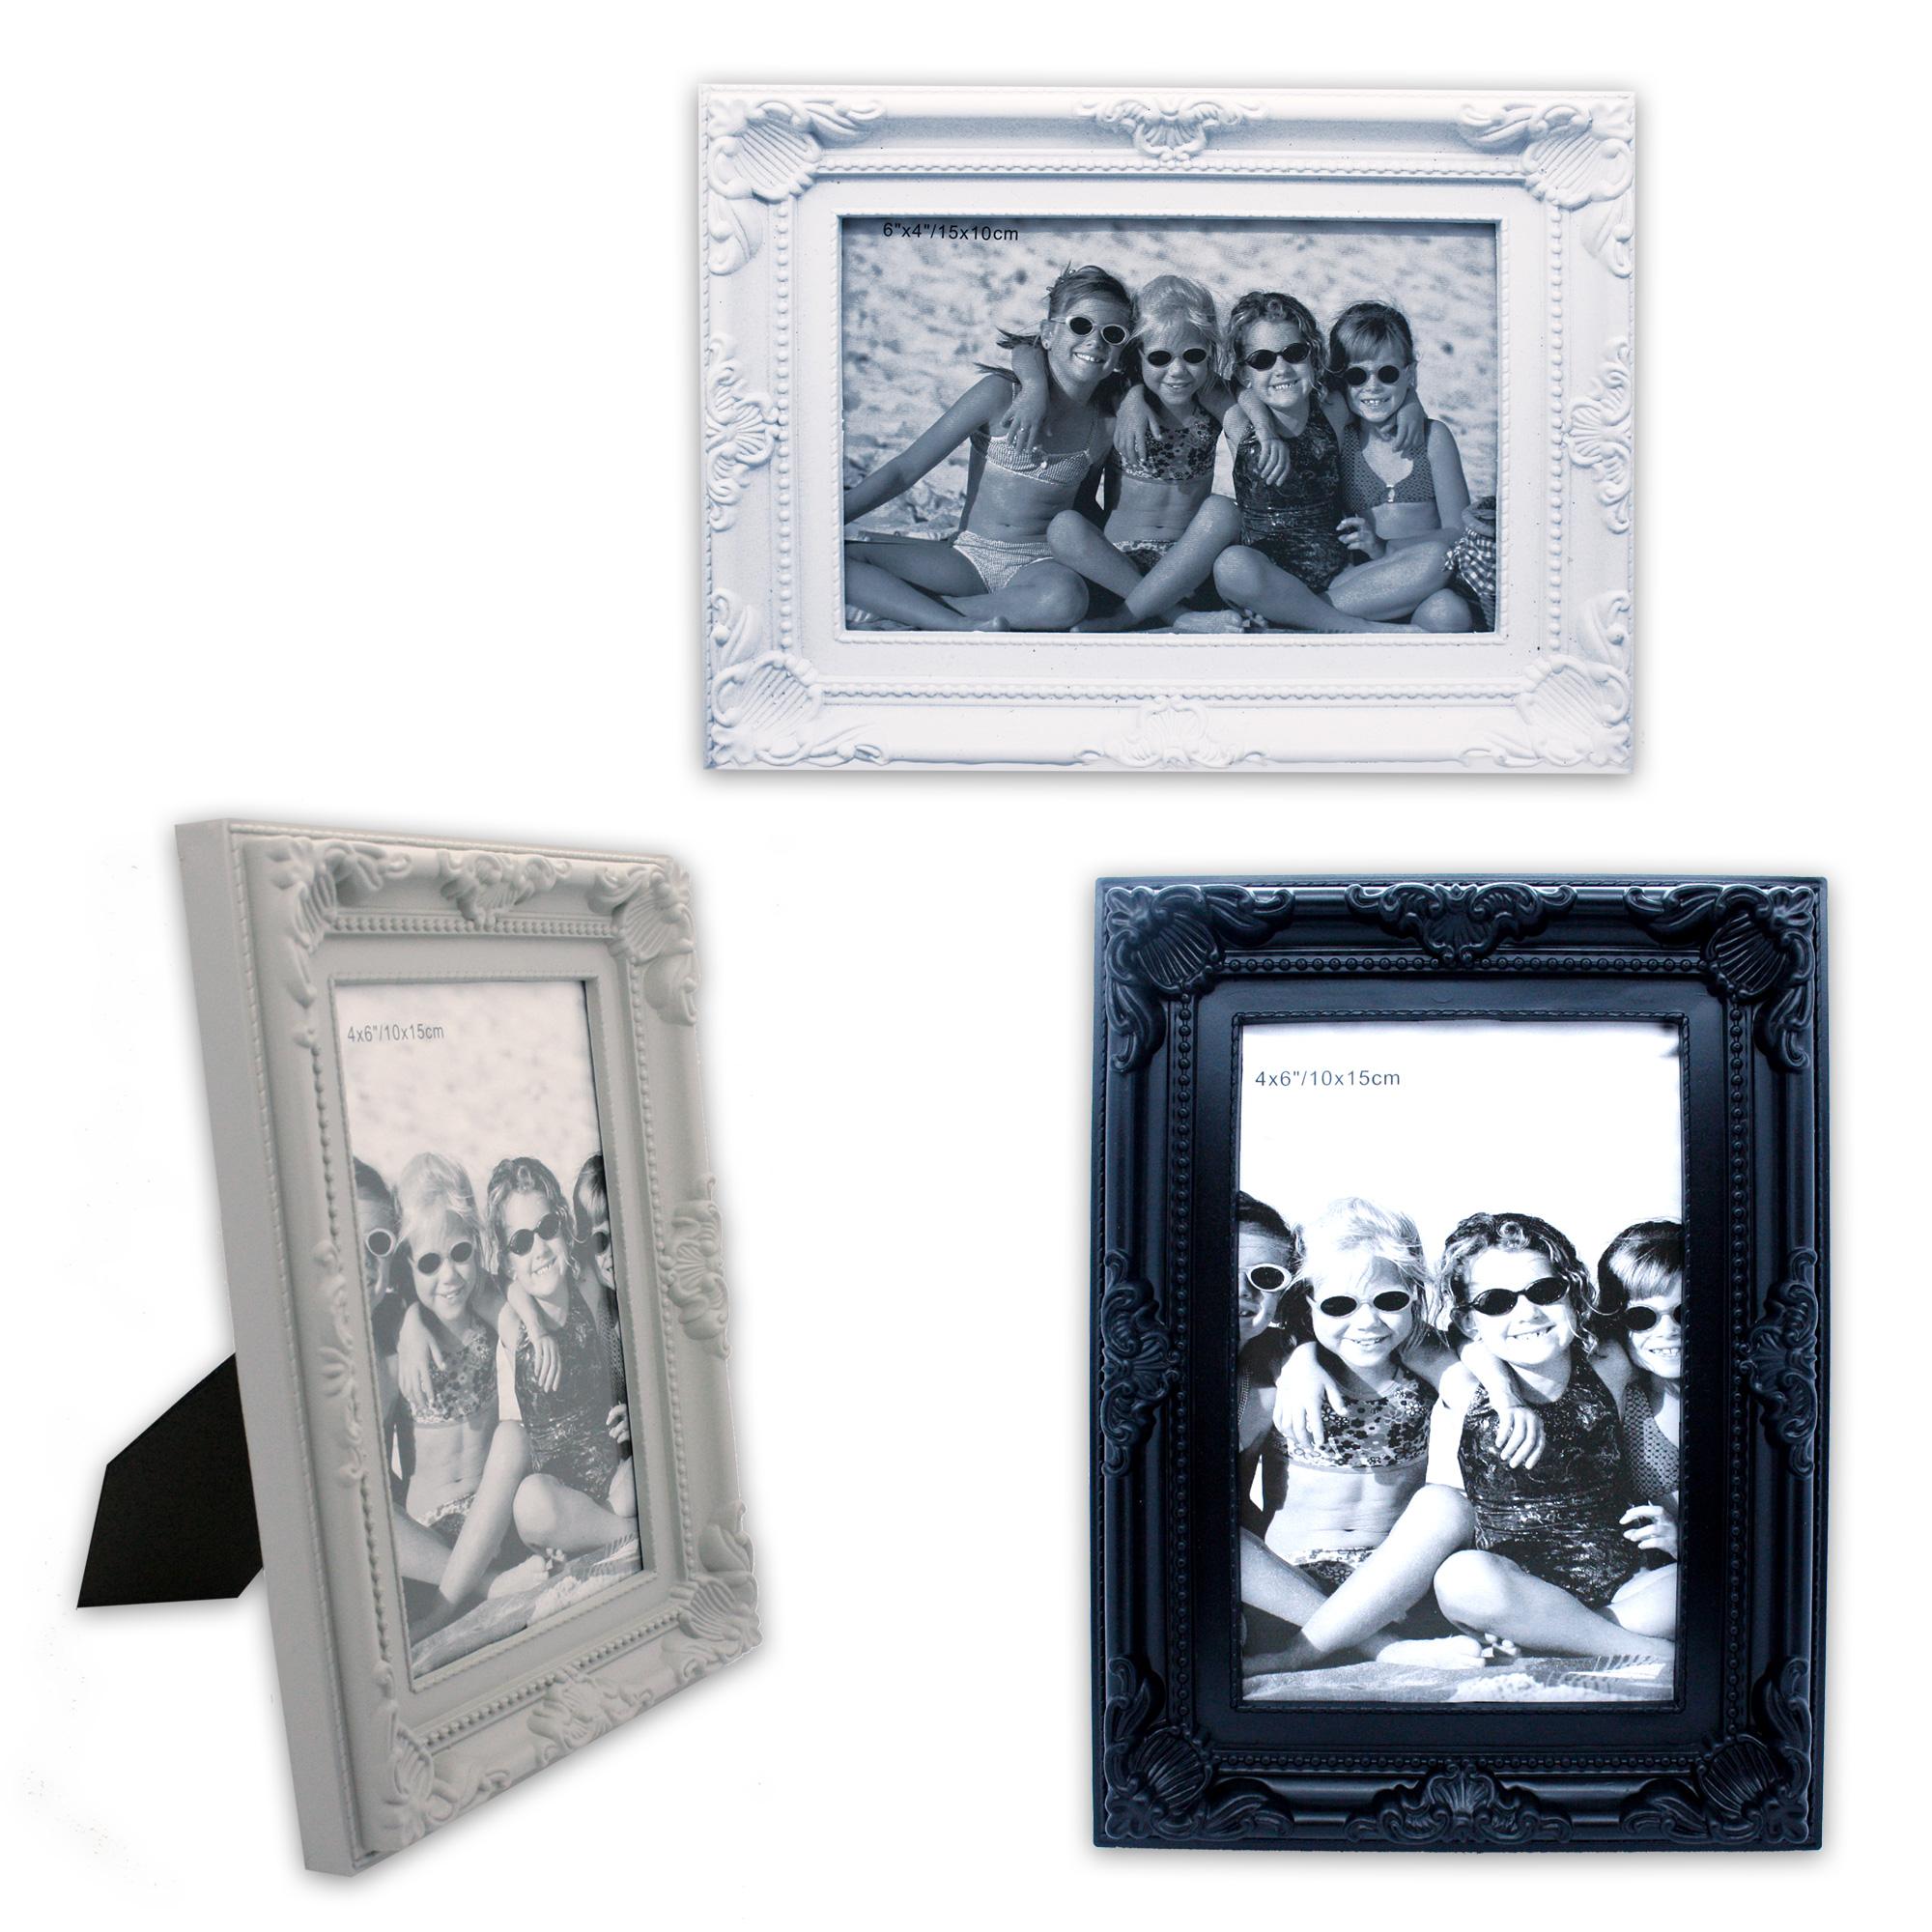 bilderrahmen fotorahmen kunststoffrahmen bild foto 10 x 15 cm weiss schwarz grau ebay. Black Bedroom Furniture Sets. Home Design Ideas